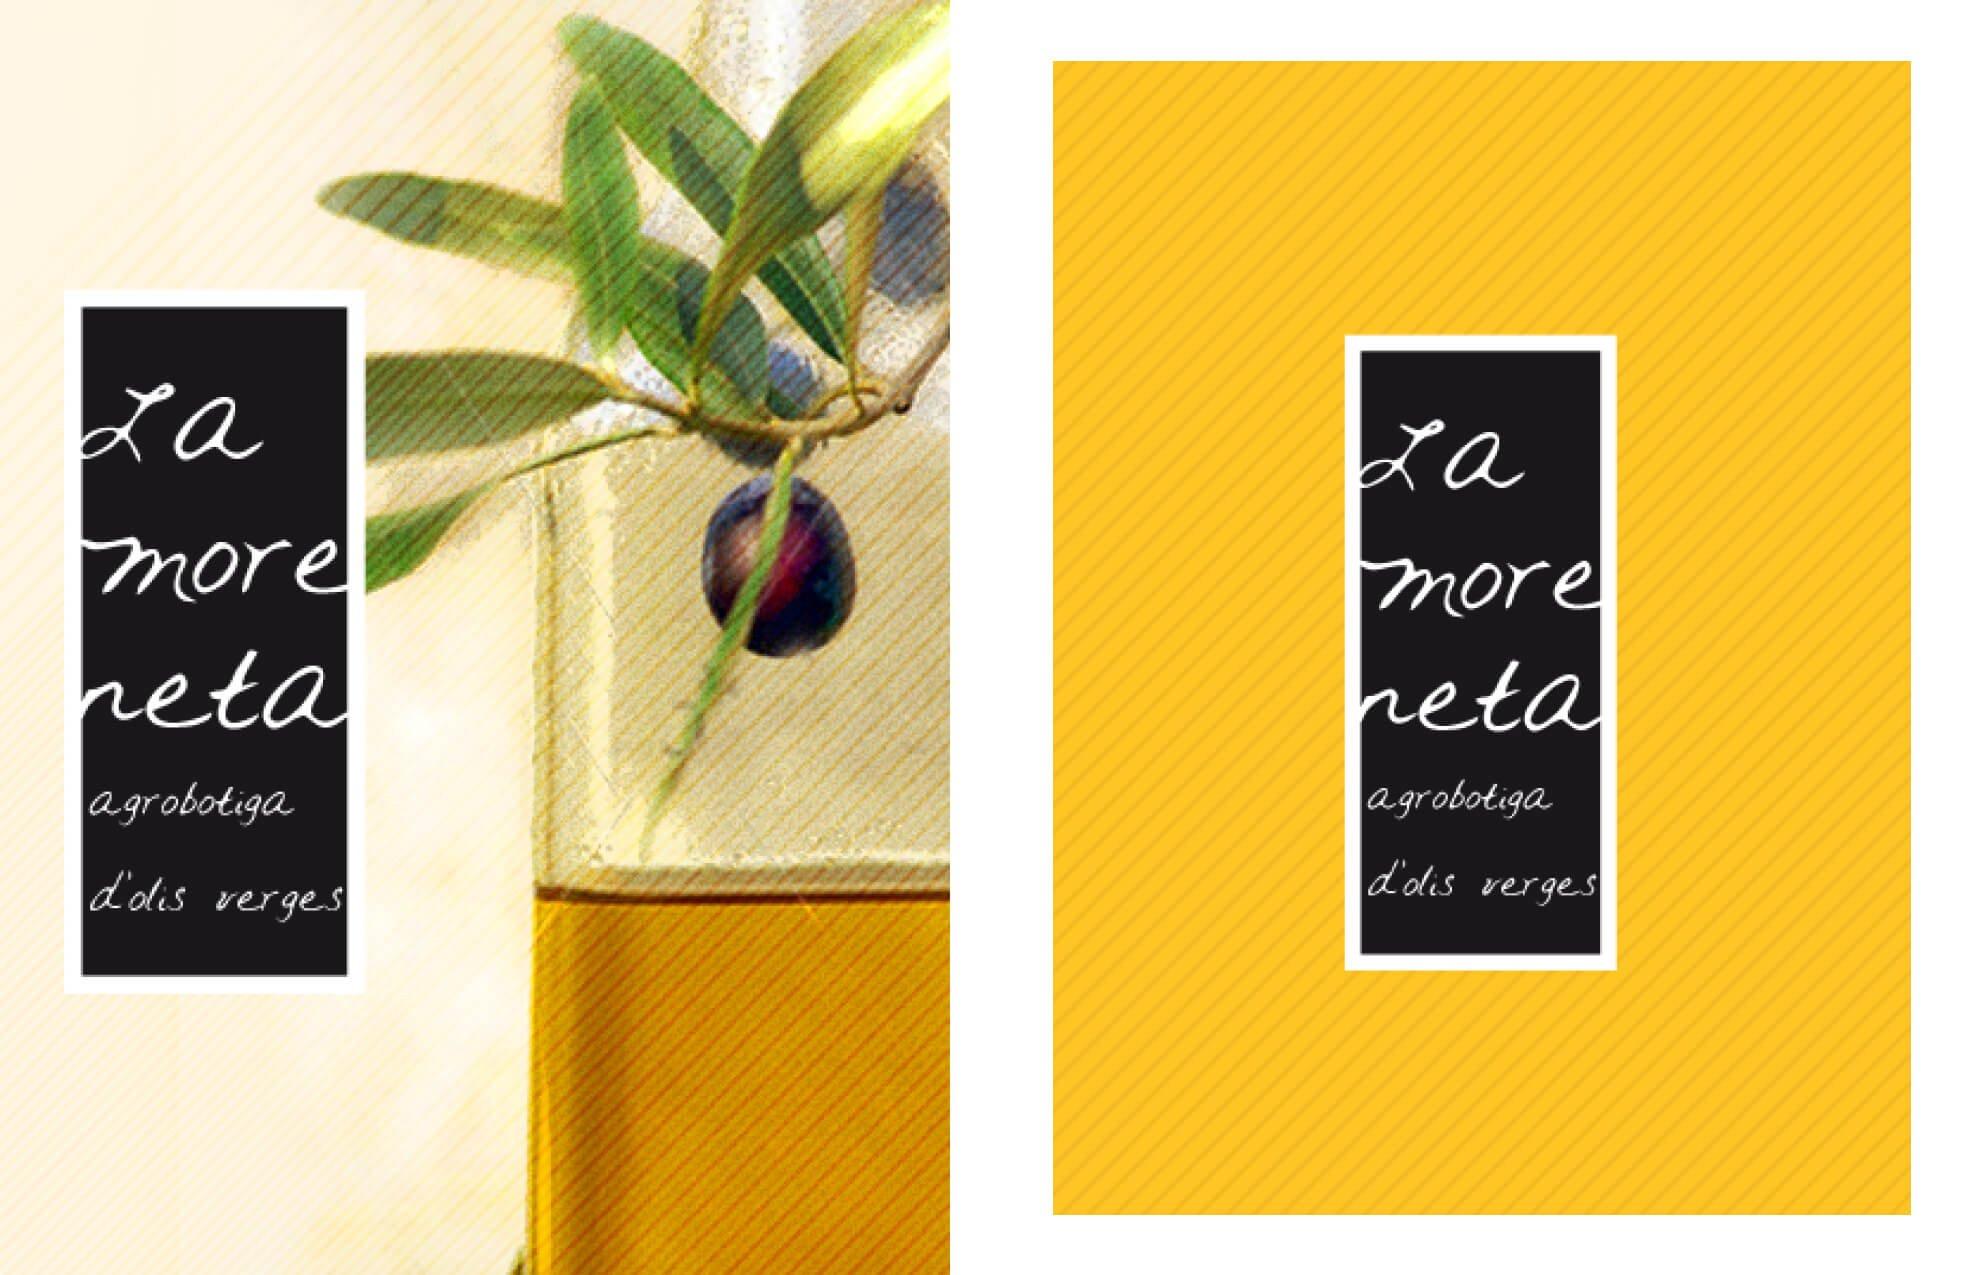 Branding agrobotiga barcelona disseny2 - Branding. Feed sector. Agrobotiga